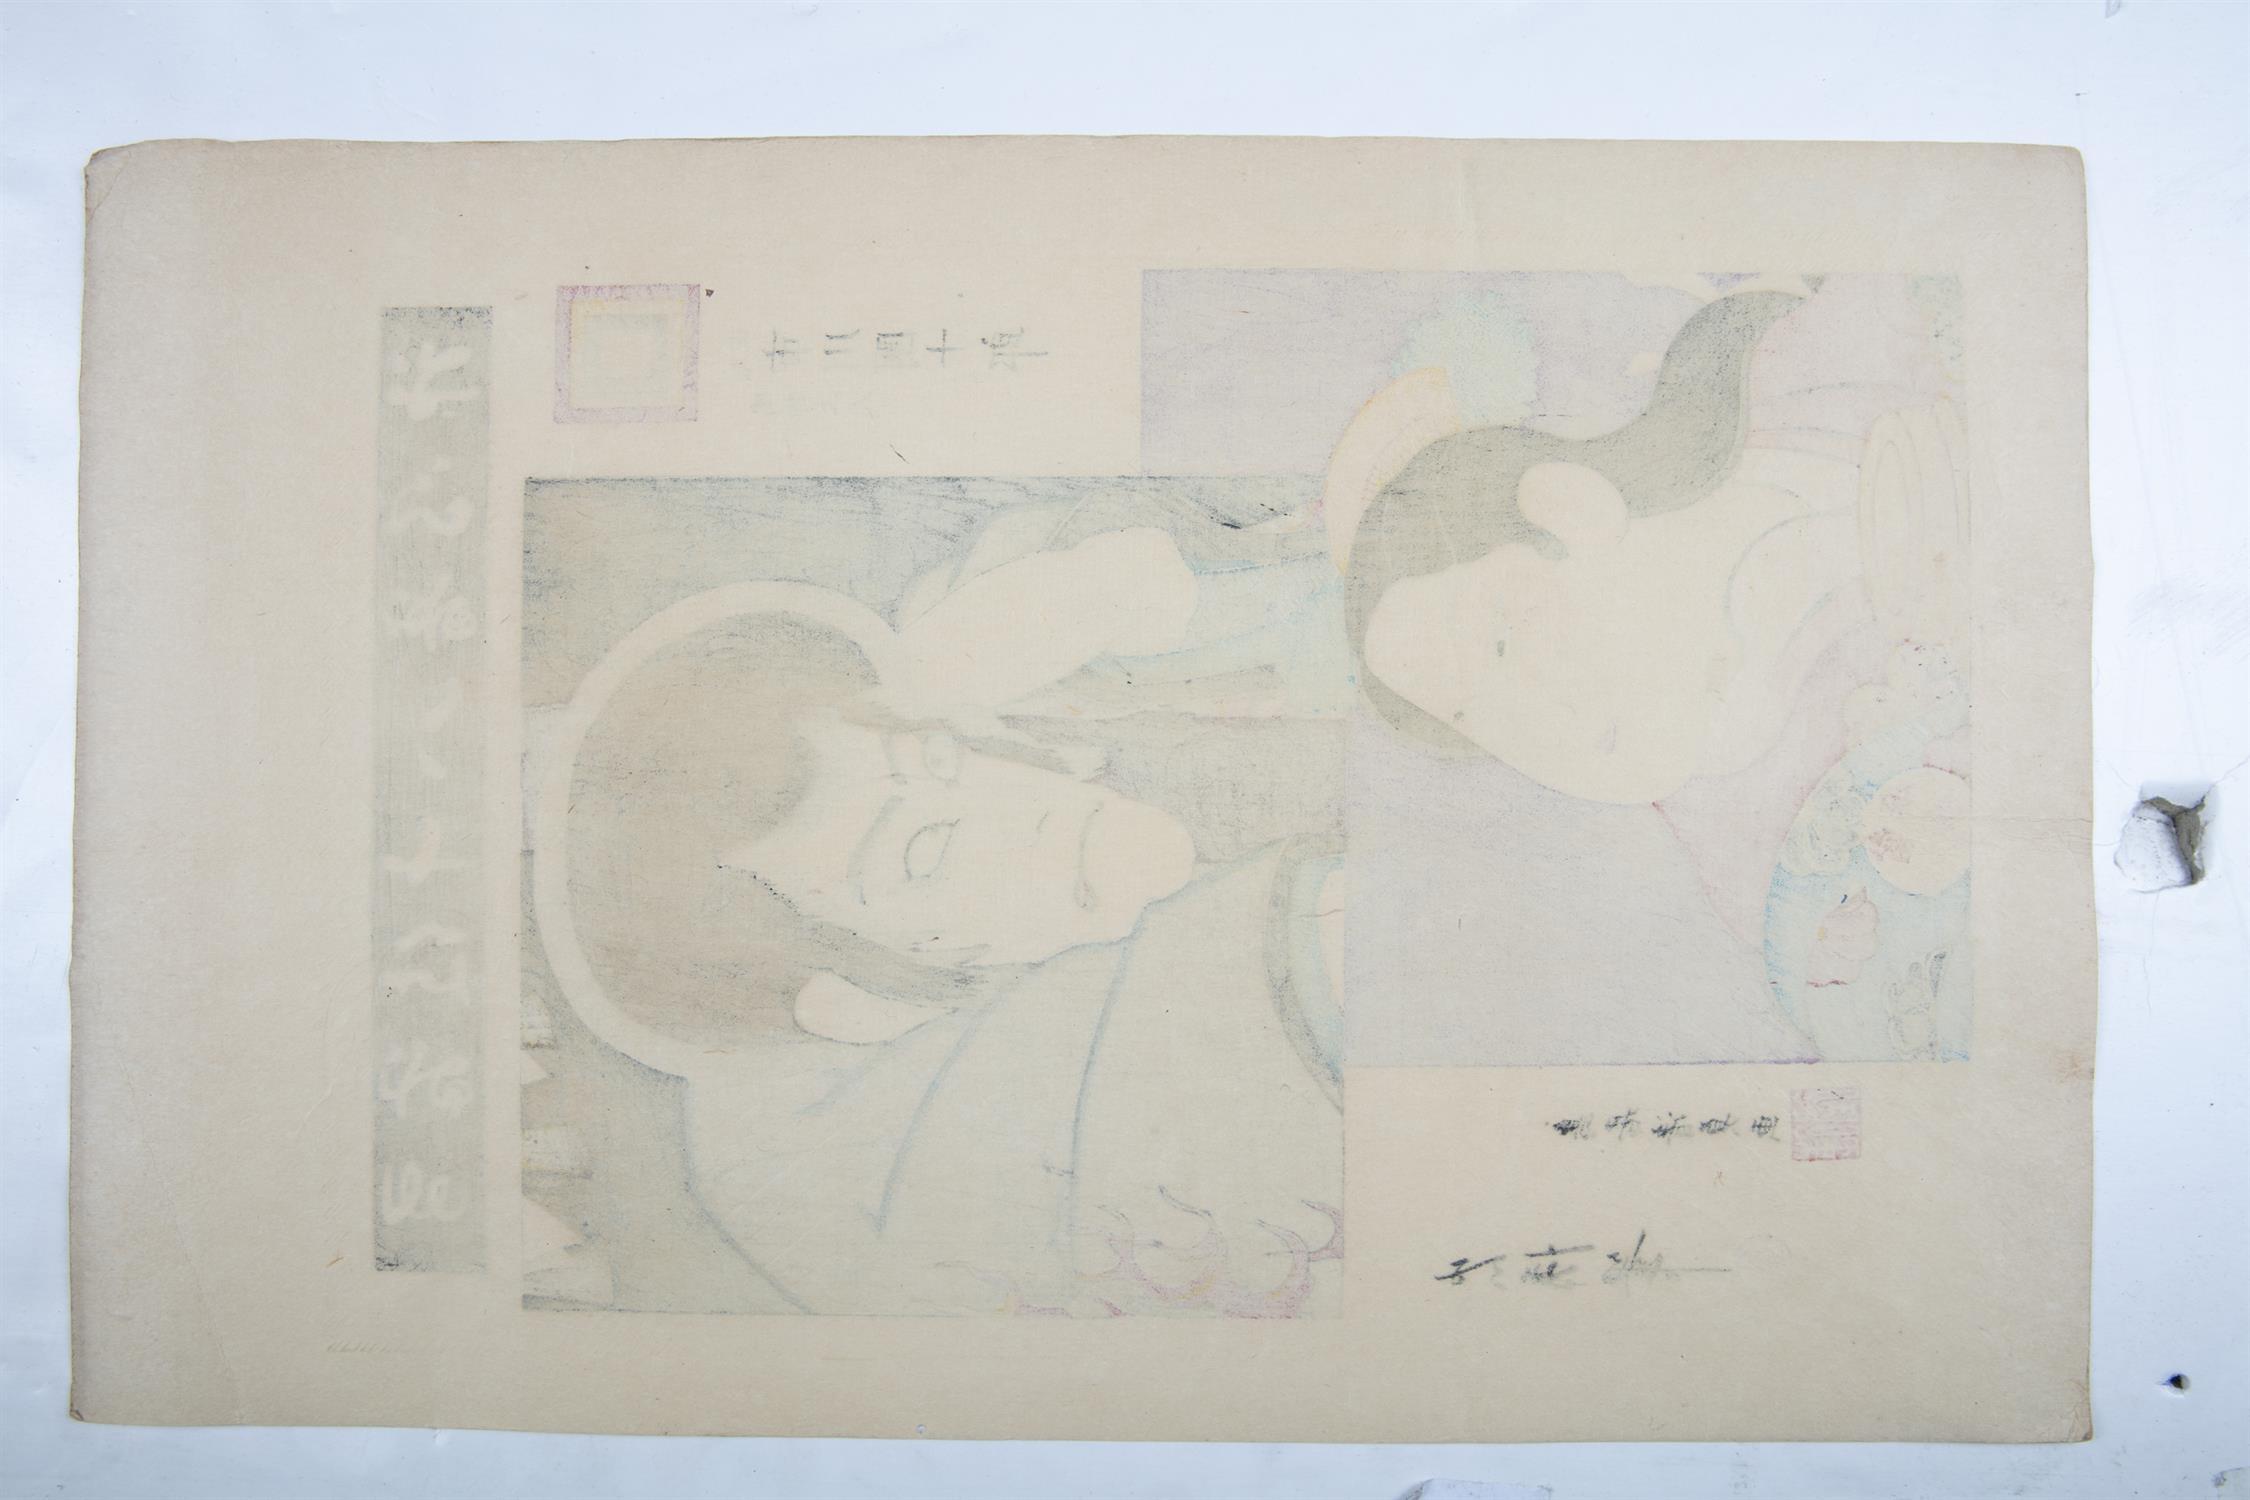 HASEGAWA KANPEI XIV (TADAKIYO) (1847-1929) Actor Ichikawa Danjûrô IX as Narukami Shônin, with an - Image 11 of 12